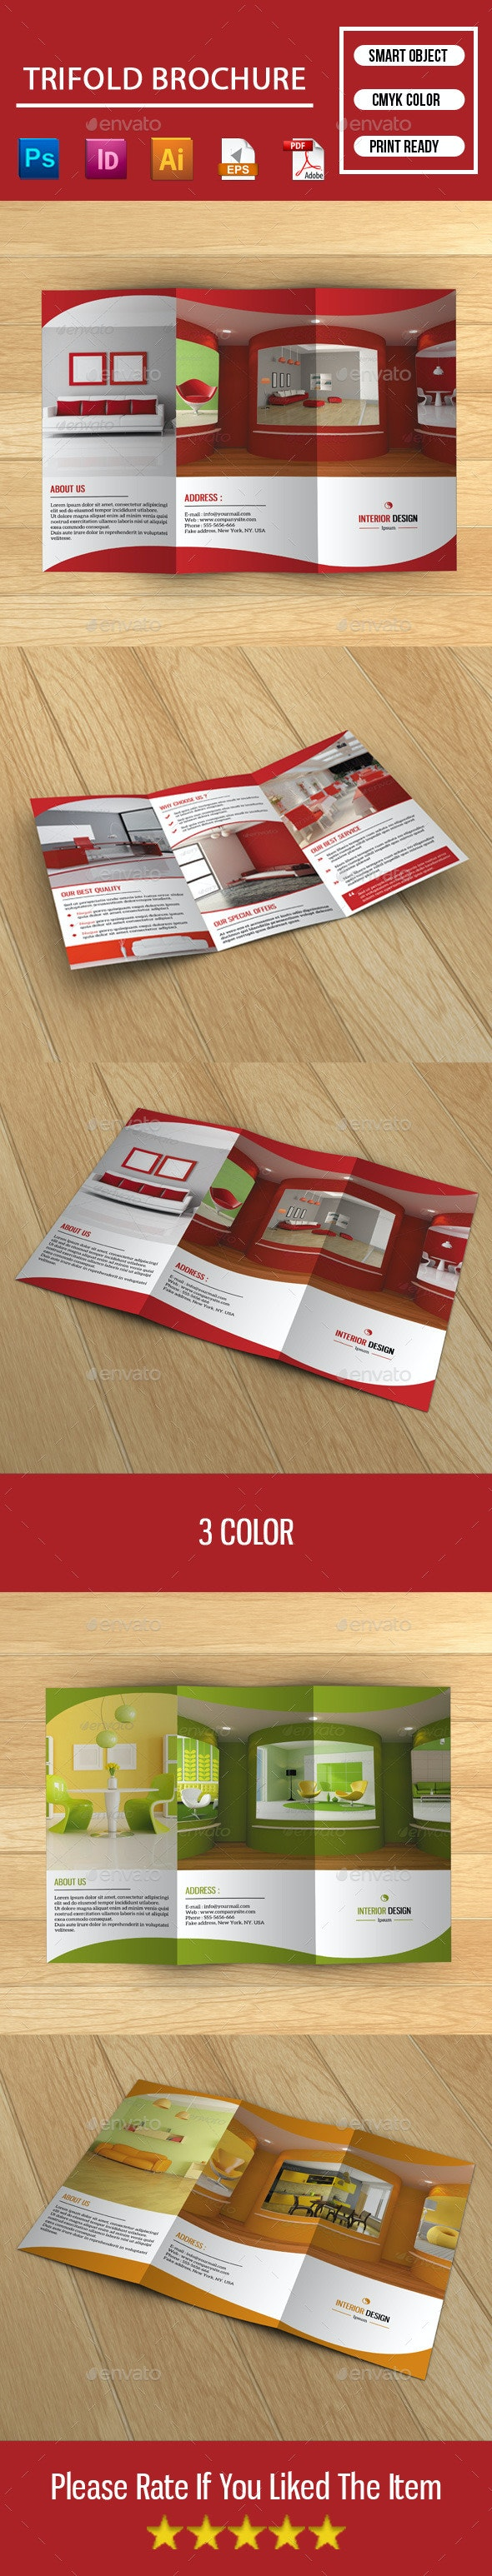 Trifold Brochure for Interior Design - Corporate Brochures